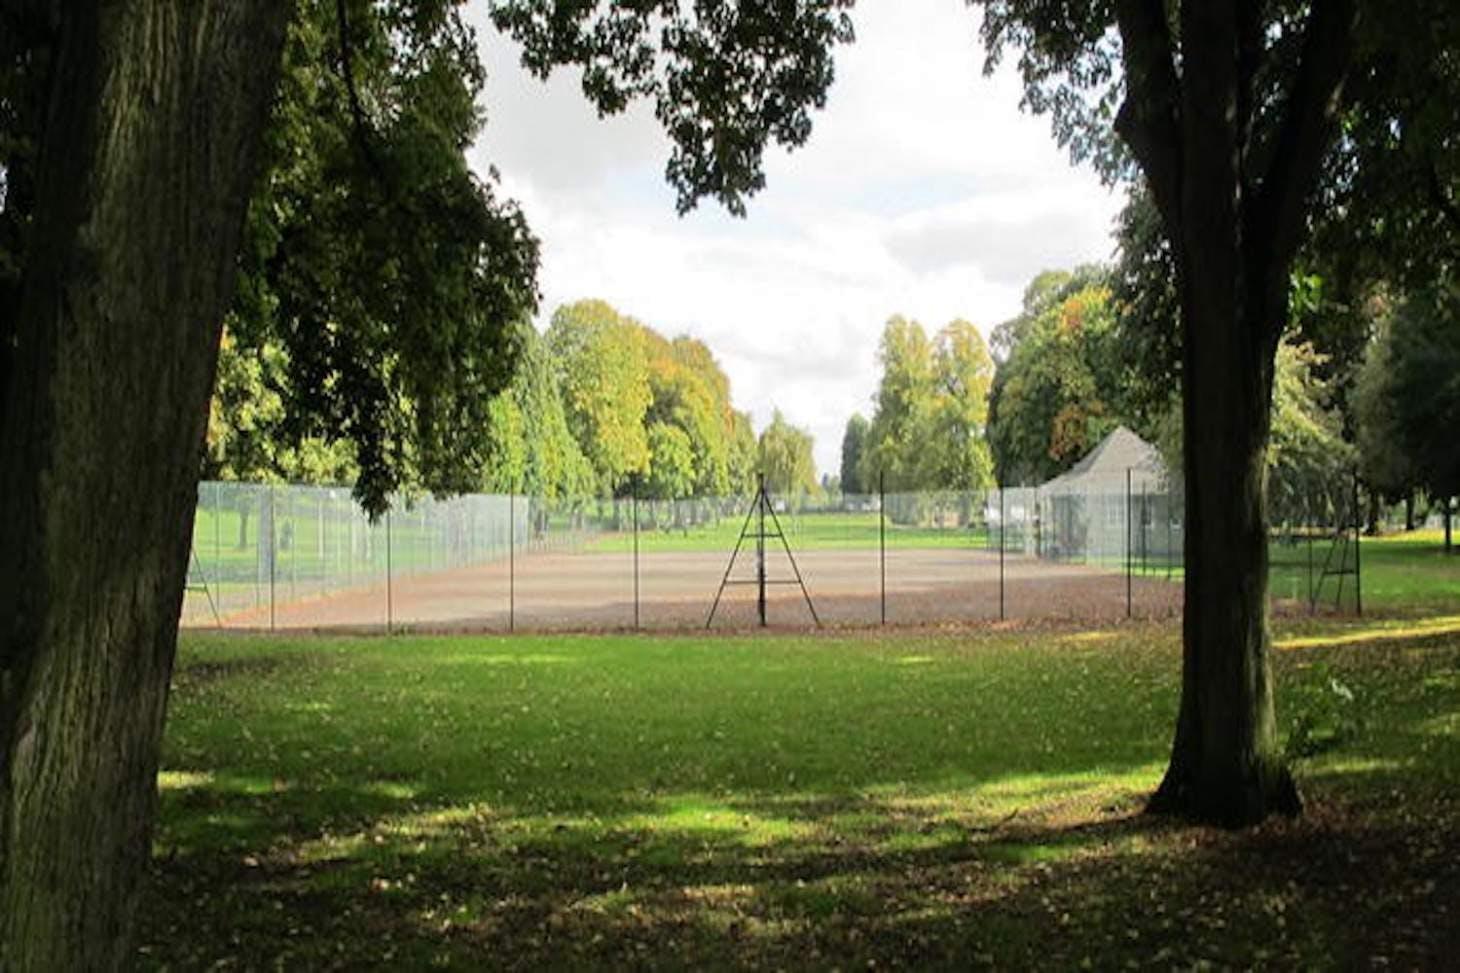 Abington Park Outdoor | Hard (macadam) tennis court